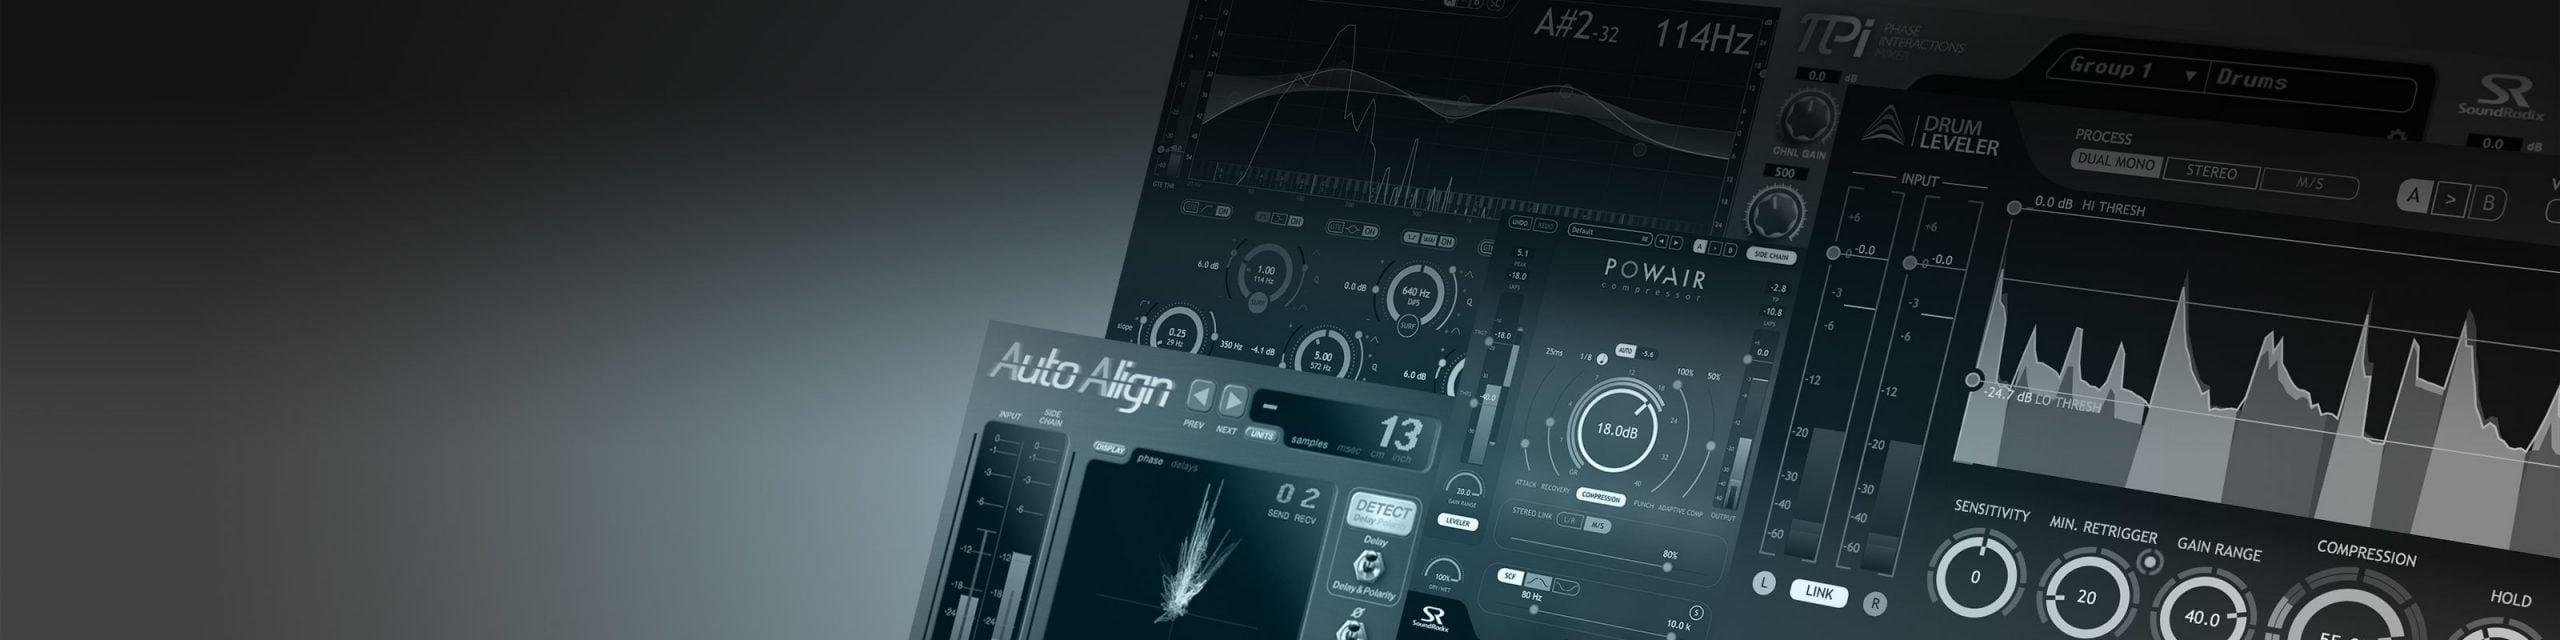 Sound Radix - הטבות על פלאגינים לסטודנטים של BPM